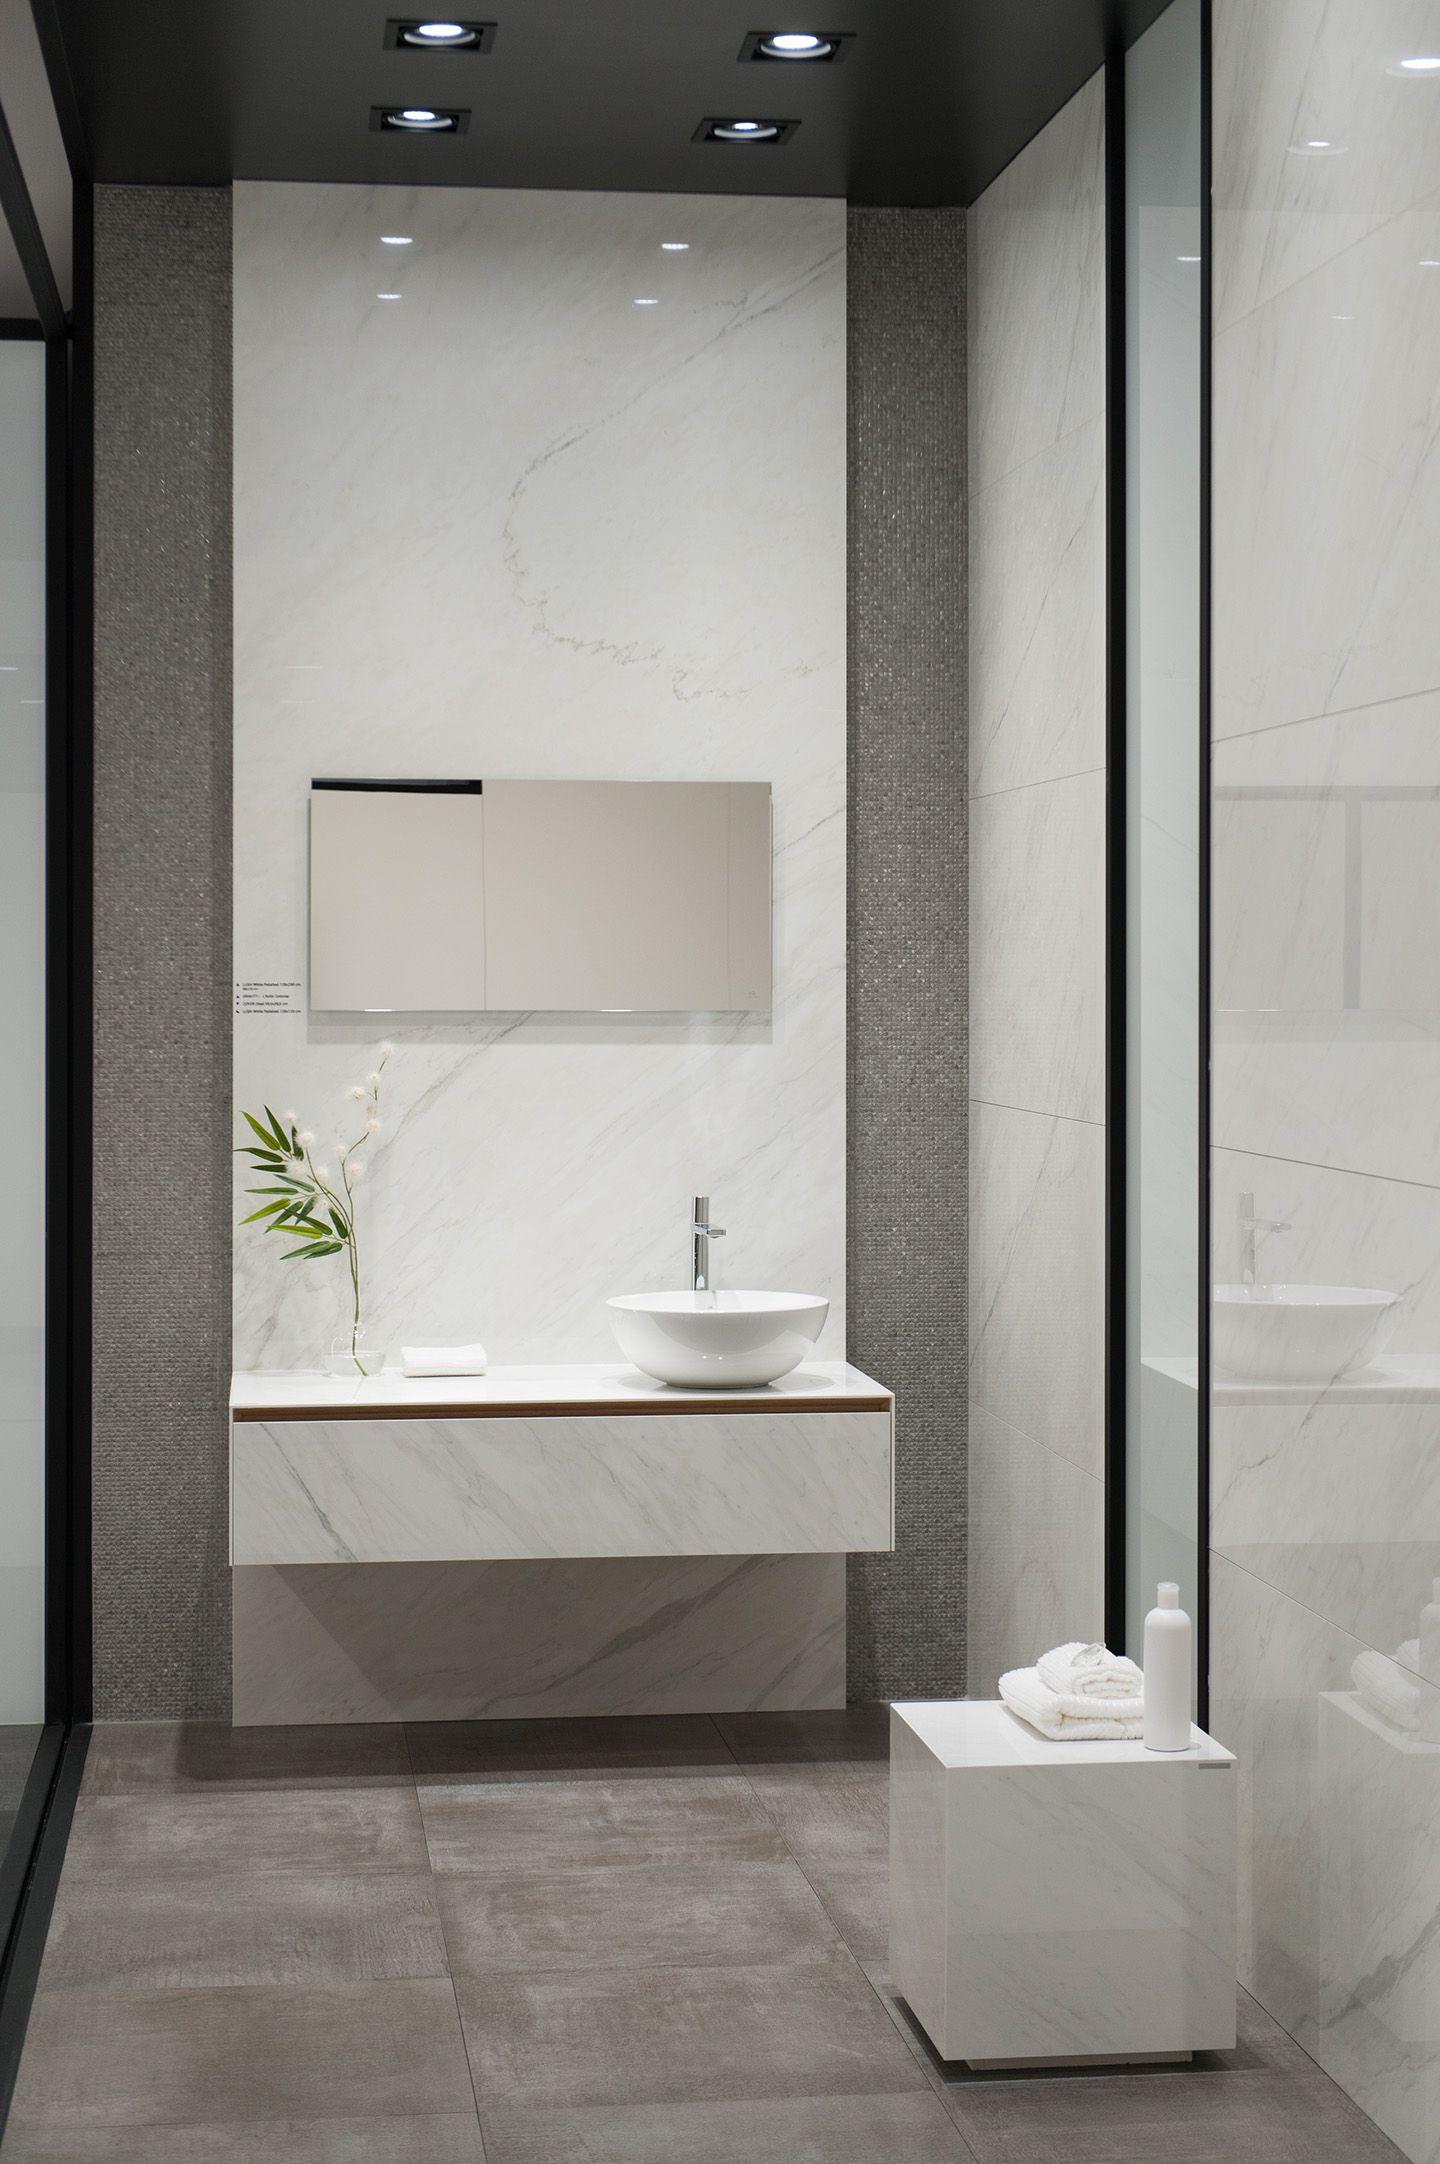 Bathroom Marble, Bathroom Closet, Mockup, Showroom, Bed Room, Countertop, Tiles,